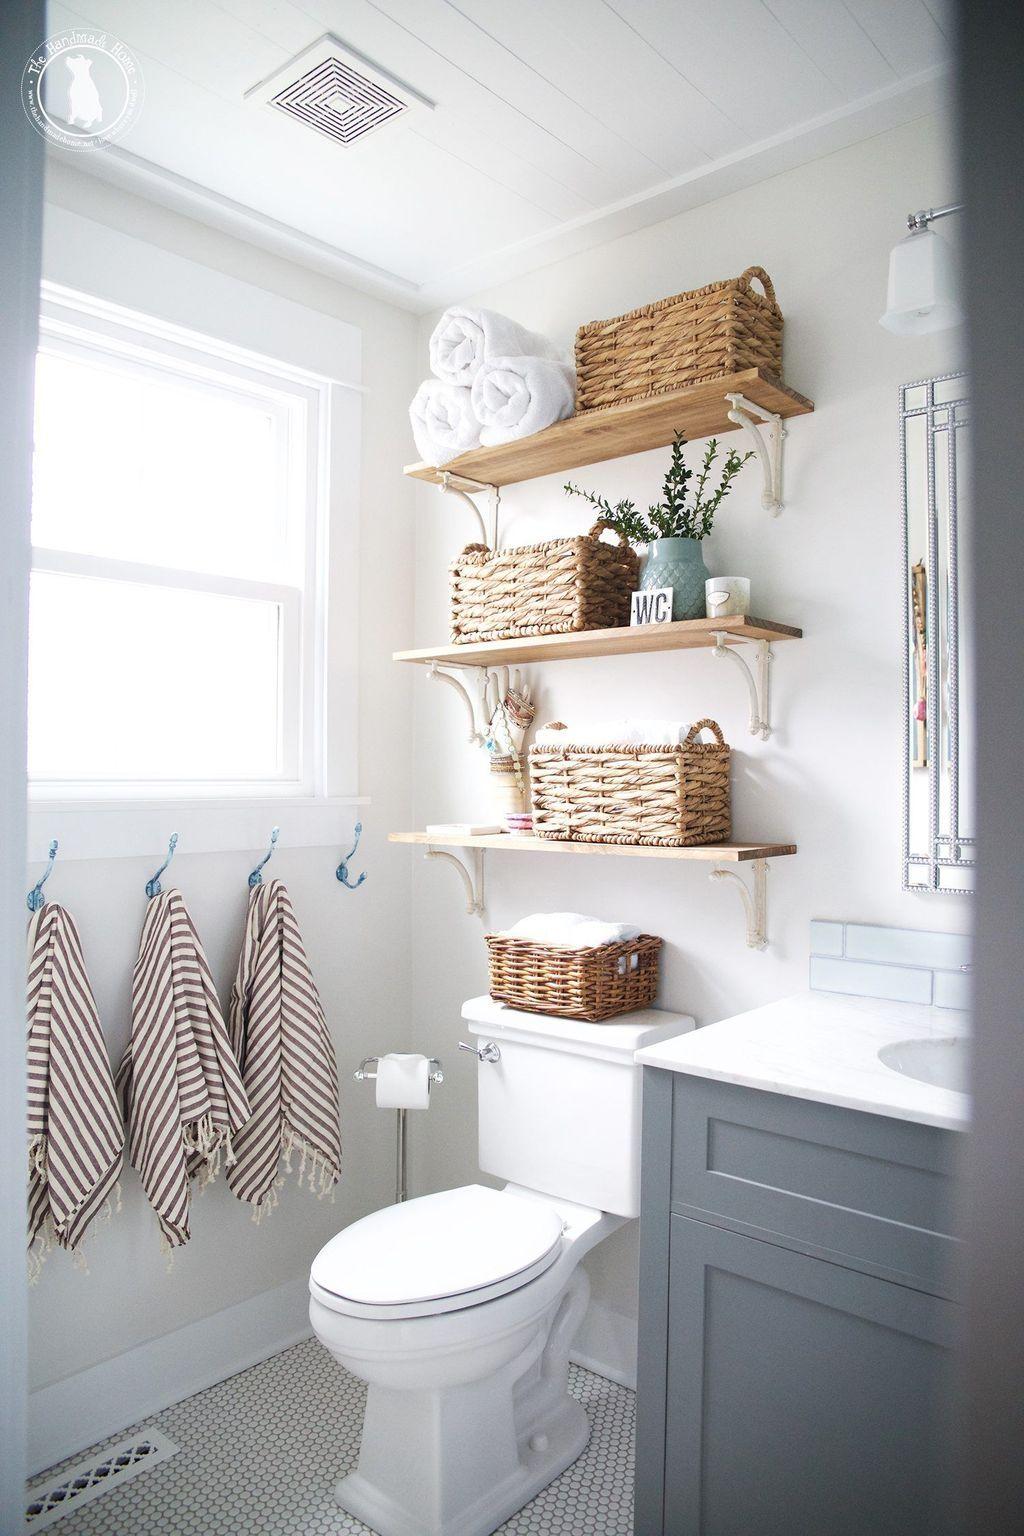 Stunning 20 Charming Bathroom Storage Ideas Bathroom Remodel Designs Small Bathroom Renovations Small Bathroom